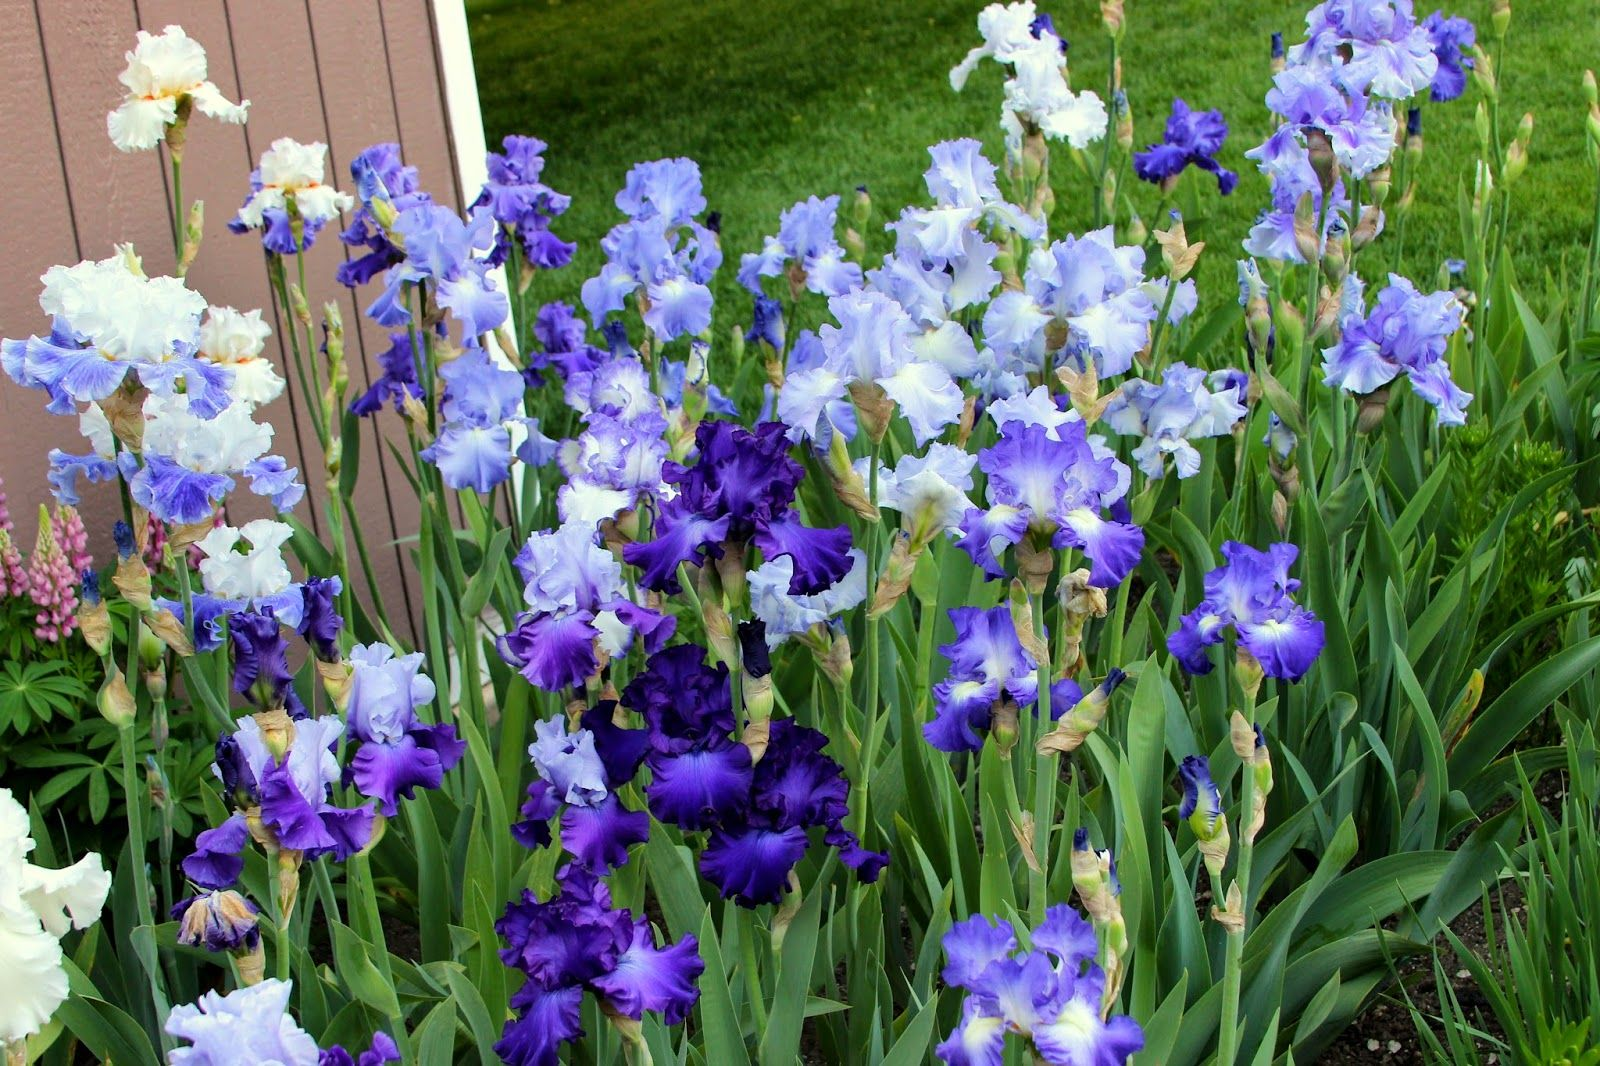 World Of Irises The Blue Iris Garden Planting A Monochromatic Tall Bearded Iris Bed Iris Garden Trees To Plant Annual Plants